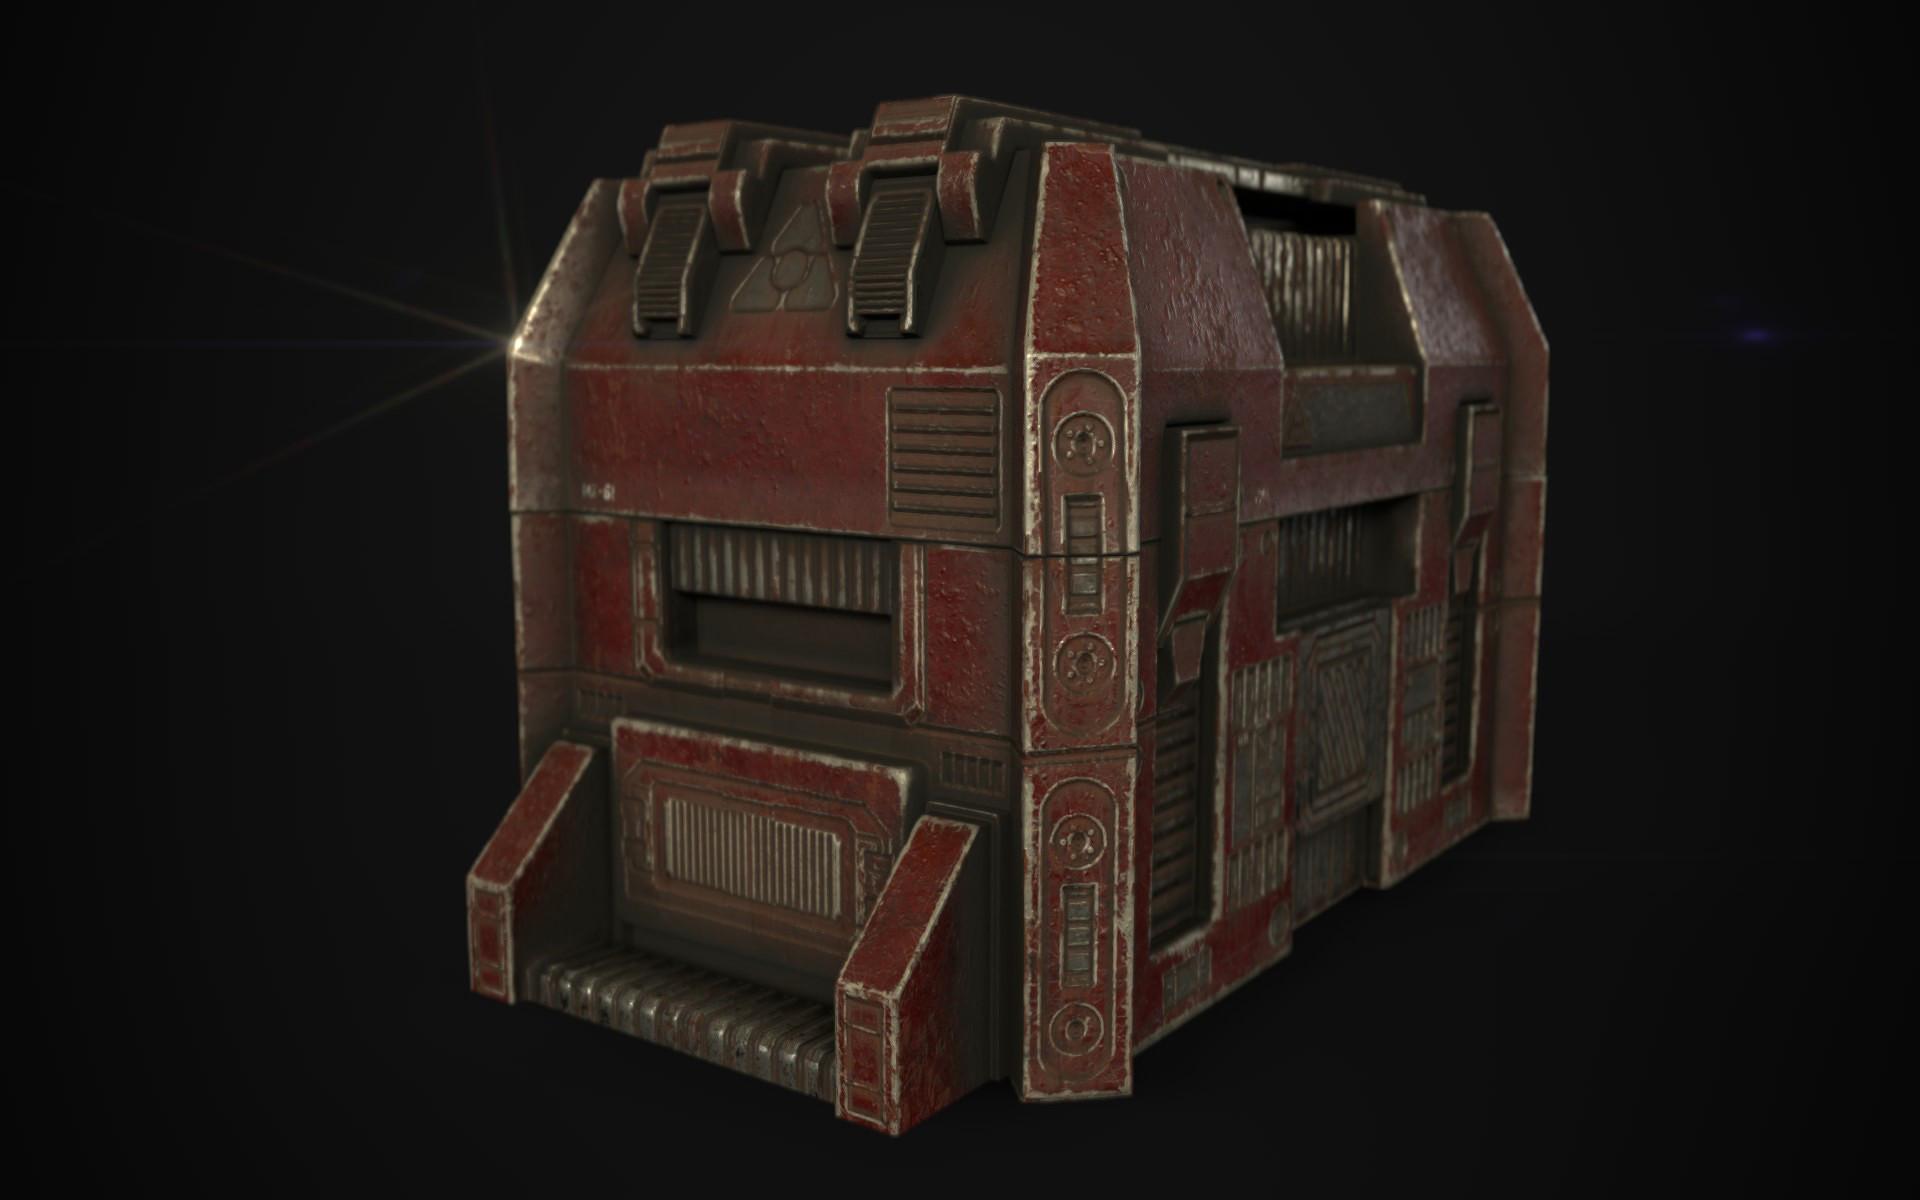 ArtStation - Substance Painter - Sci-Fi Crate, Griffin Leadabrand